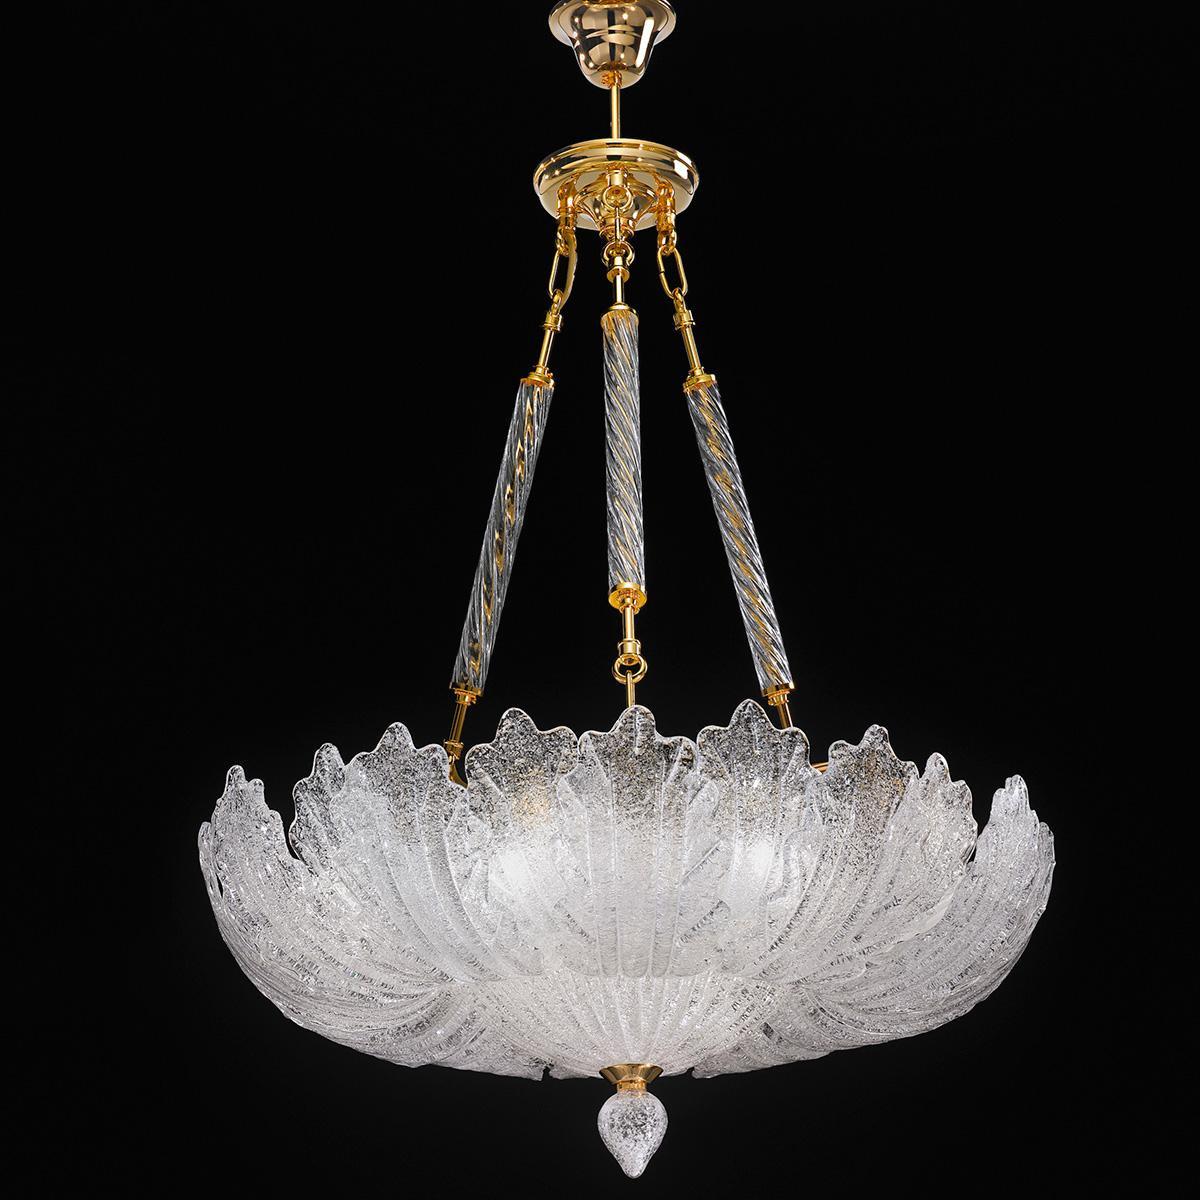 """Oliviera"" suspension en verre de Murano - 10 lumières - transparent"